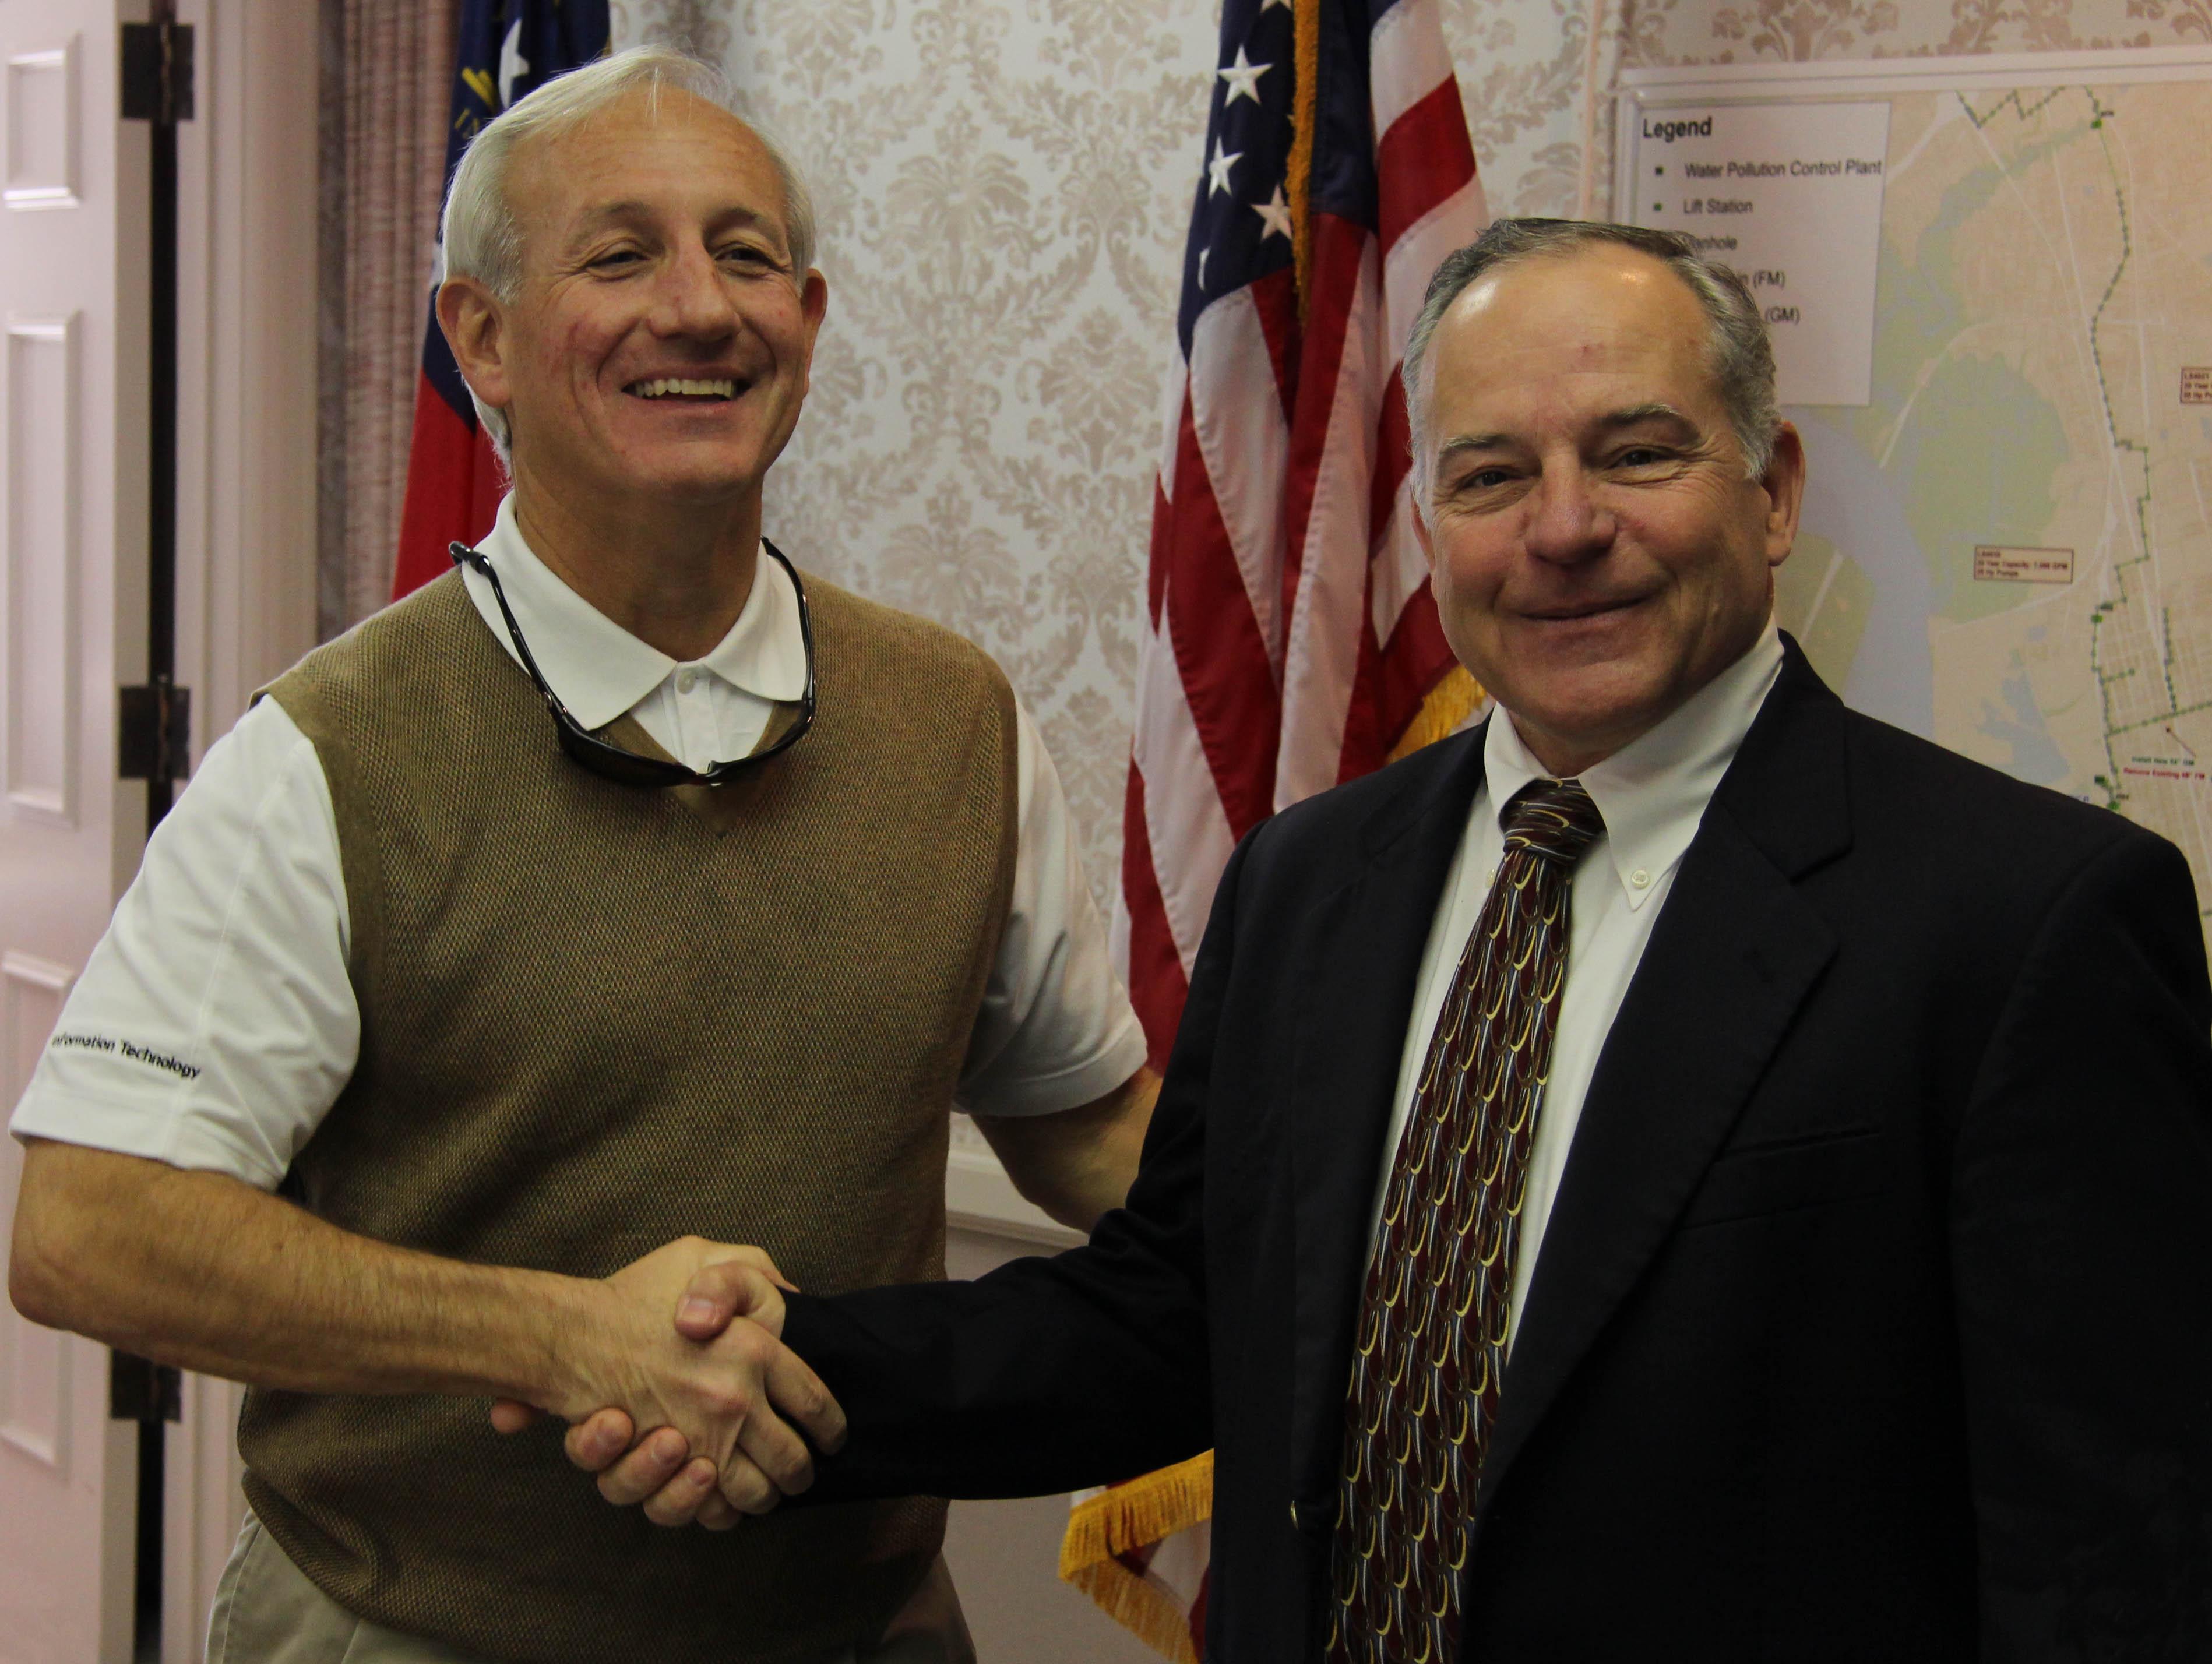 Chairman Provenzano and Executive Director Swan